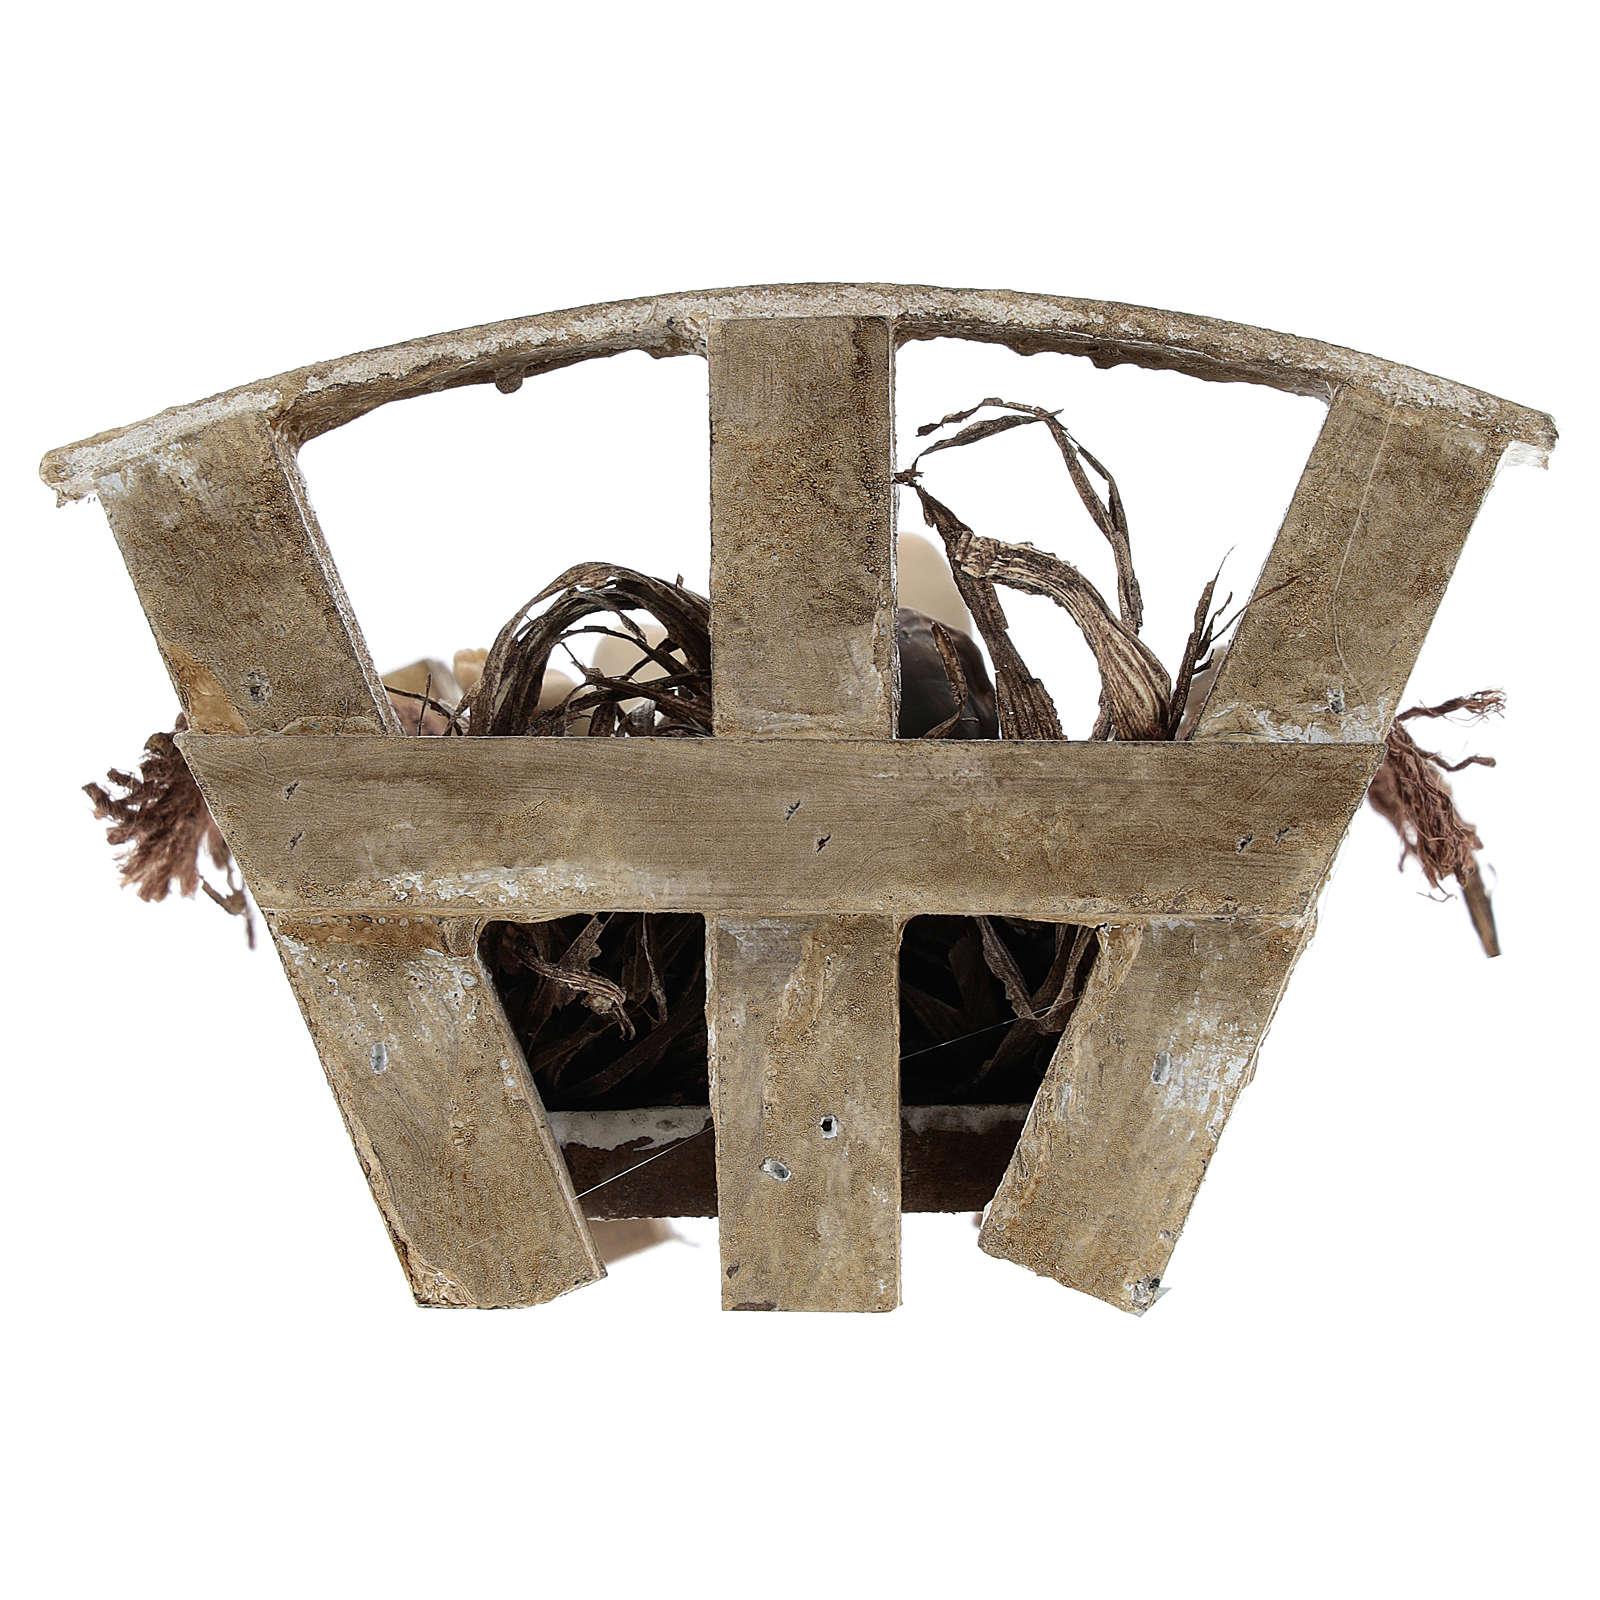 Baby Jesus in wood manger, resin 16 cm (real h) 3